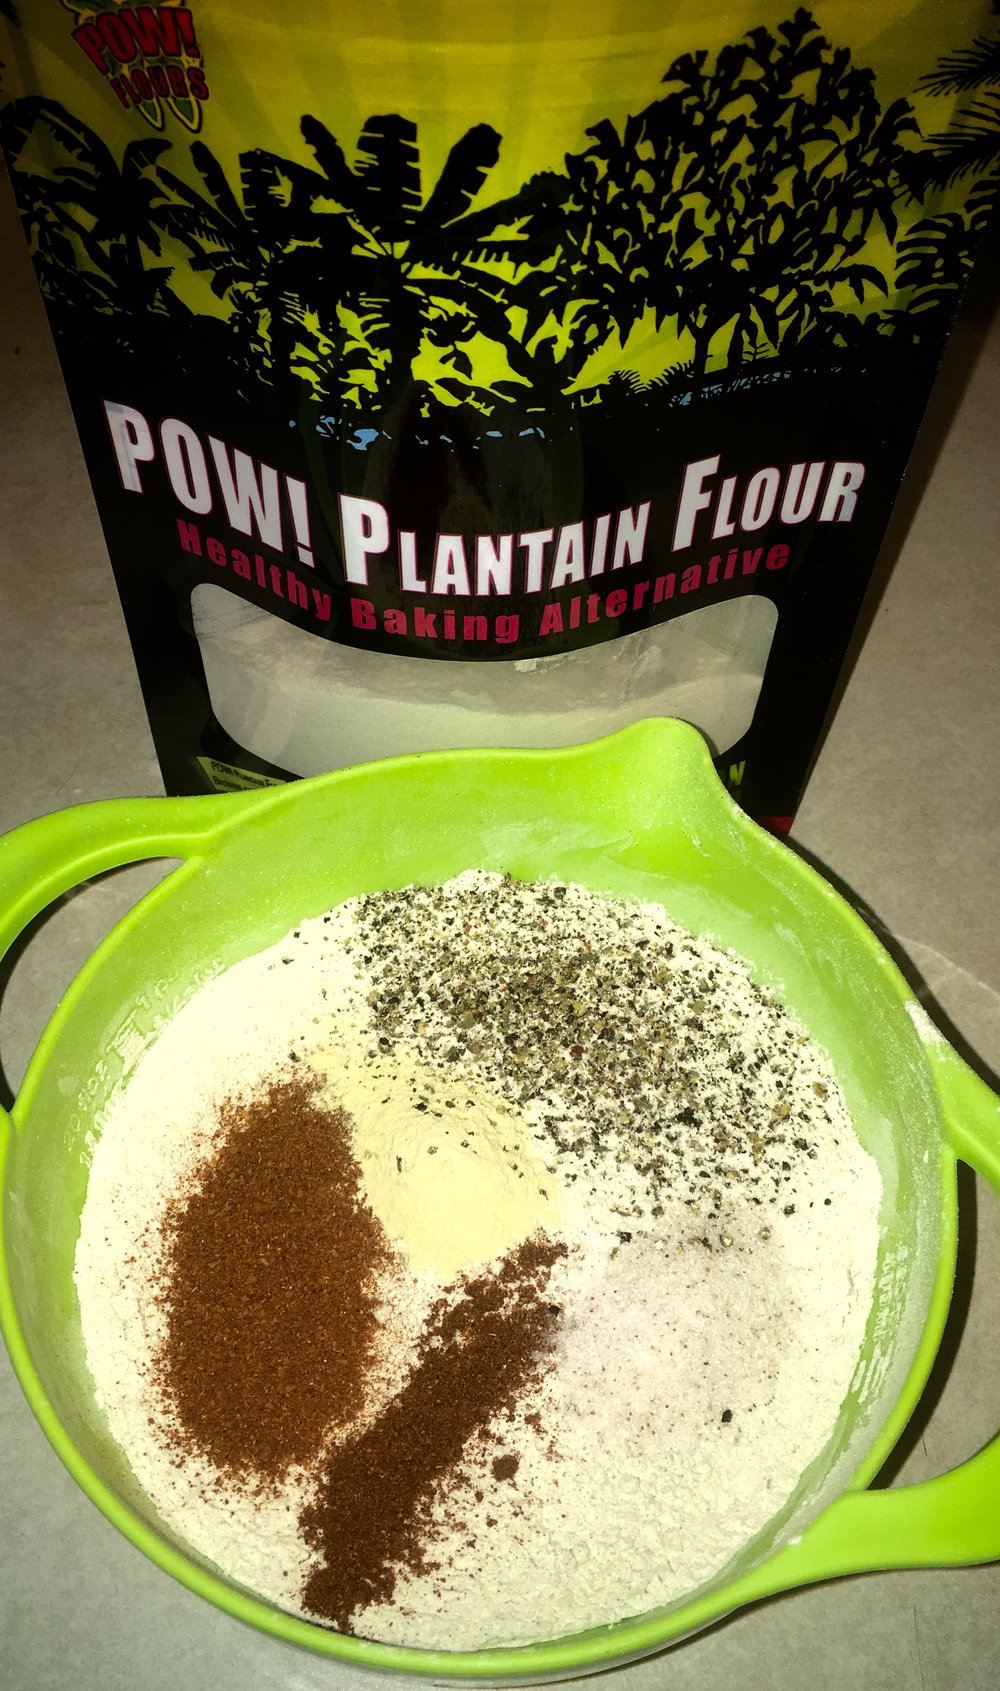 POW! Plantain Flour Savory Gluten-Free Fried Foods